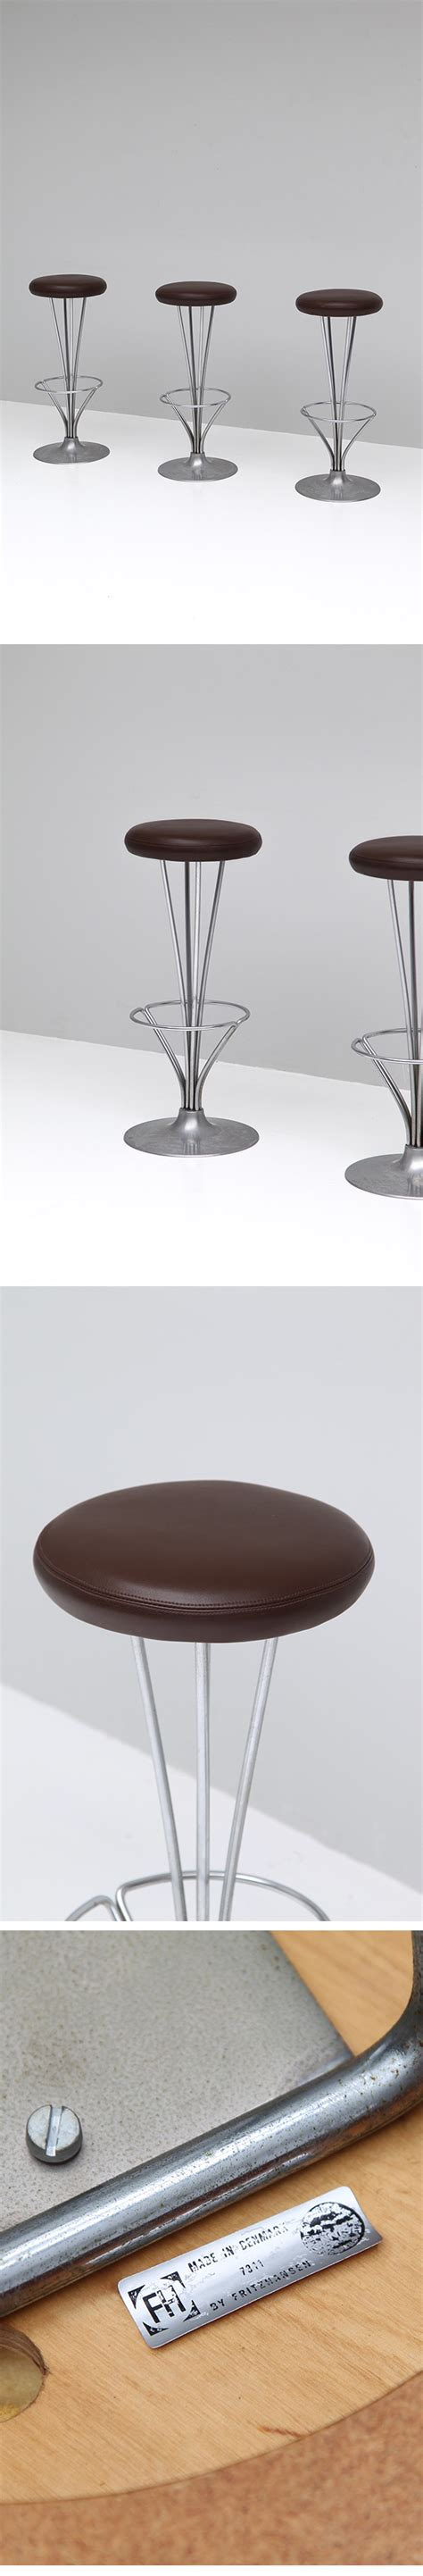 Fritz Hansen Bar Stool by City Furniture Piet Hein For Fritz Hansen Bar Stools